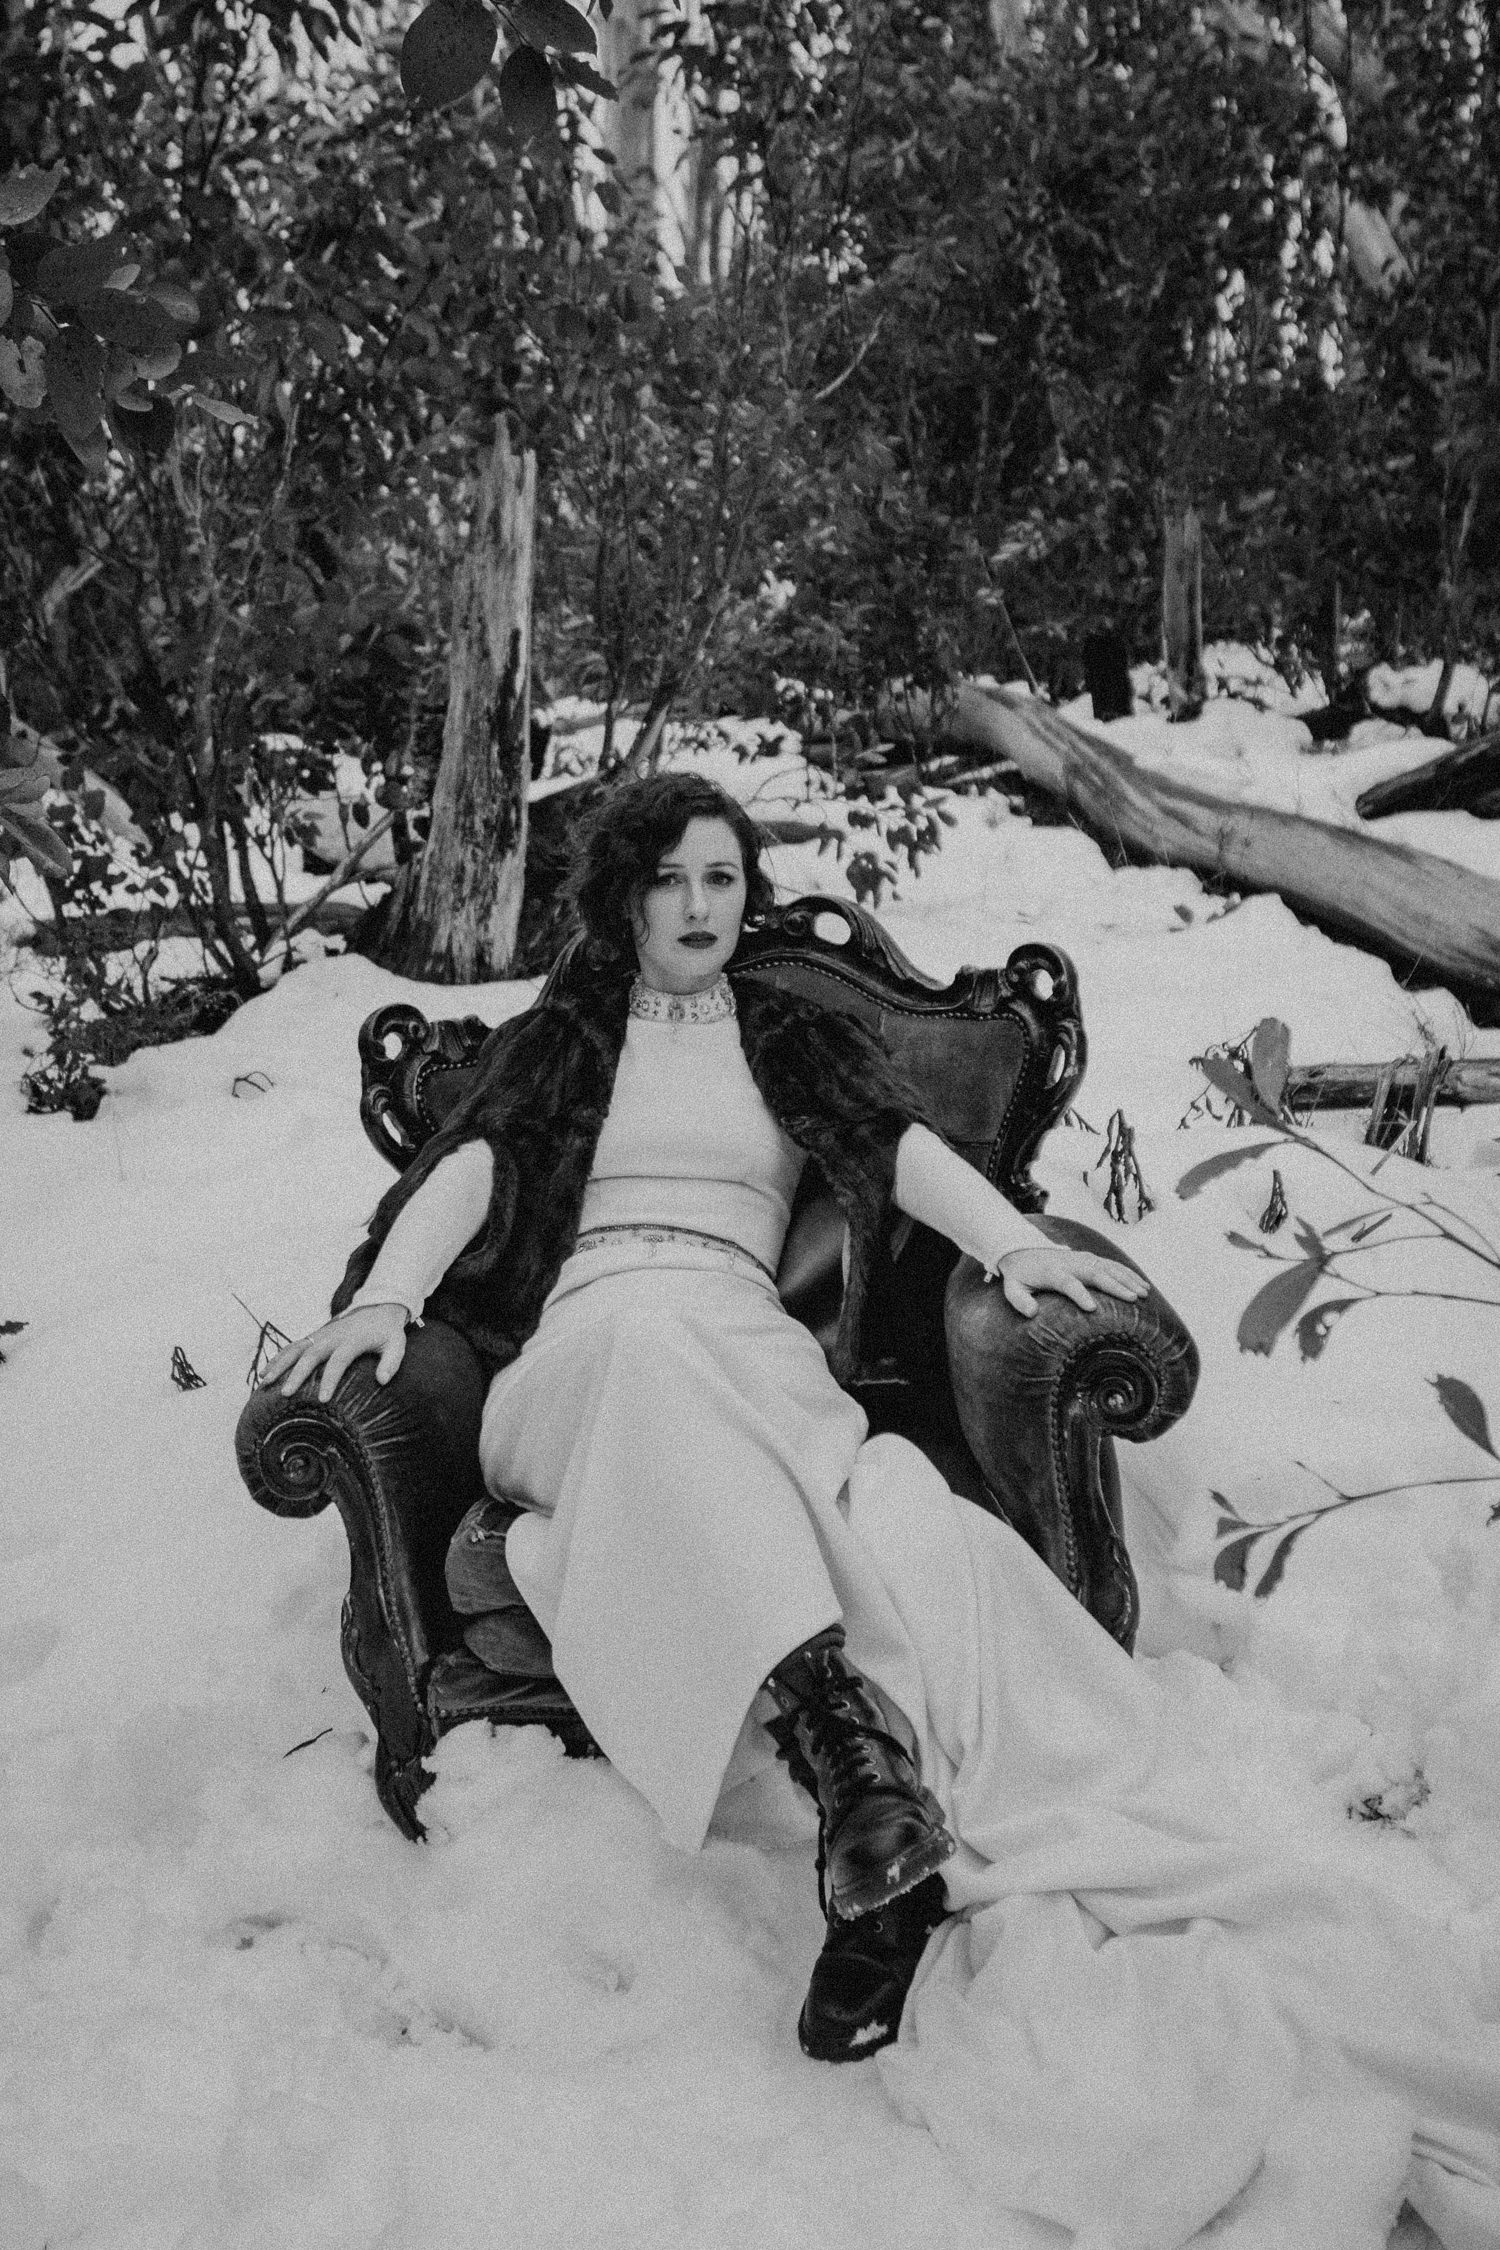 Winter_Elopement_Amie_Nick_Anna_Taylor_184-766A1833.jpg